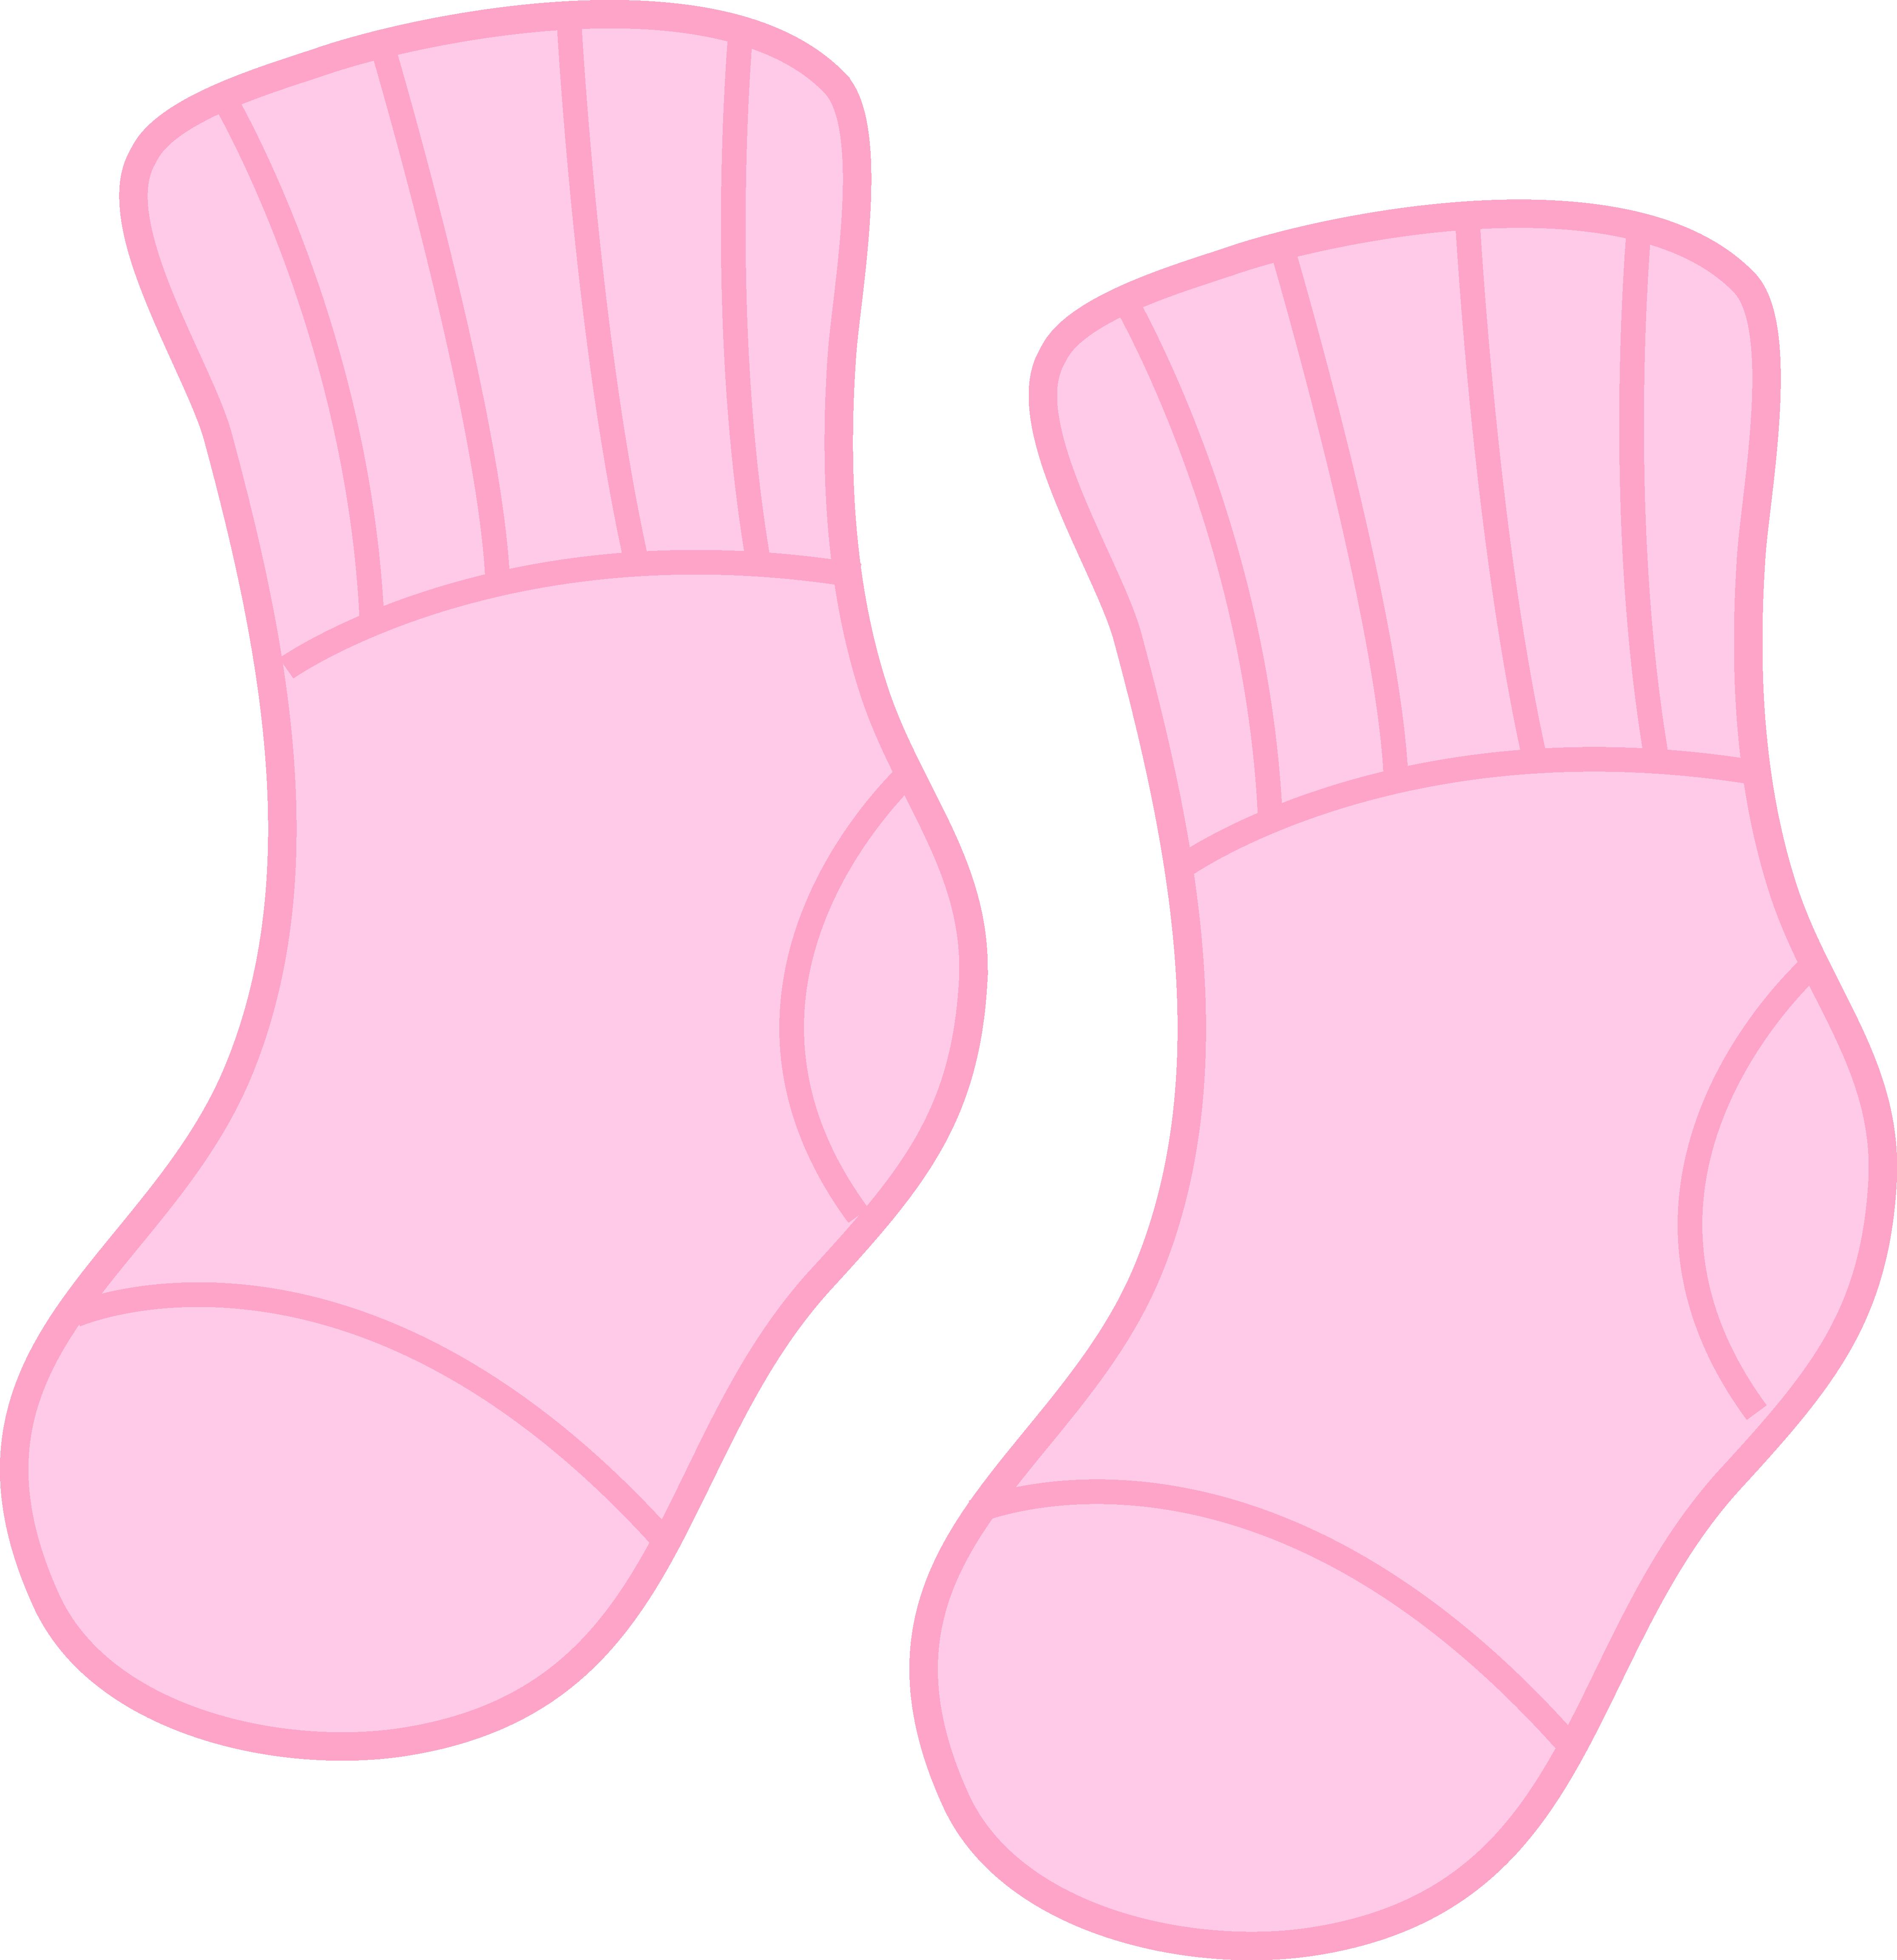 4462x4611 Baby Feet Clip Art